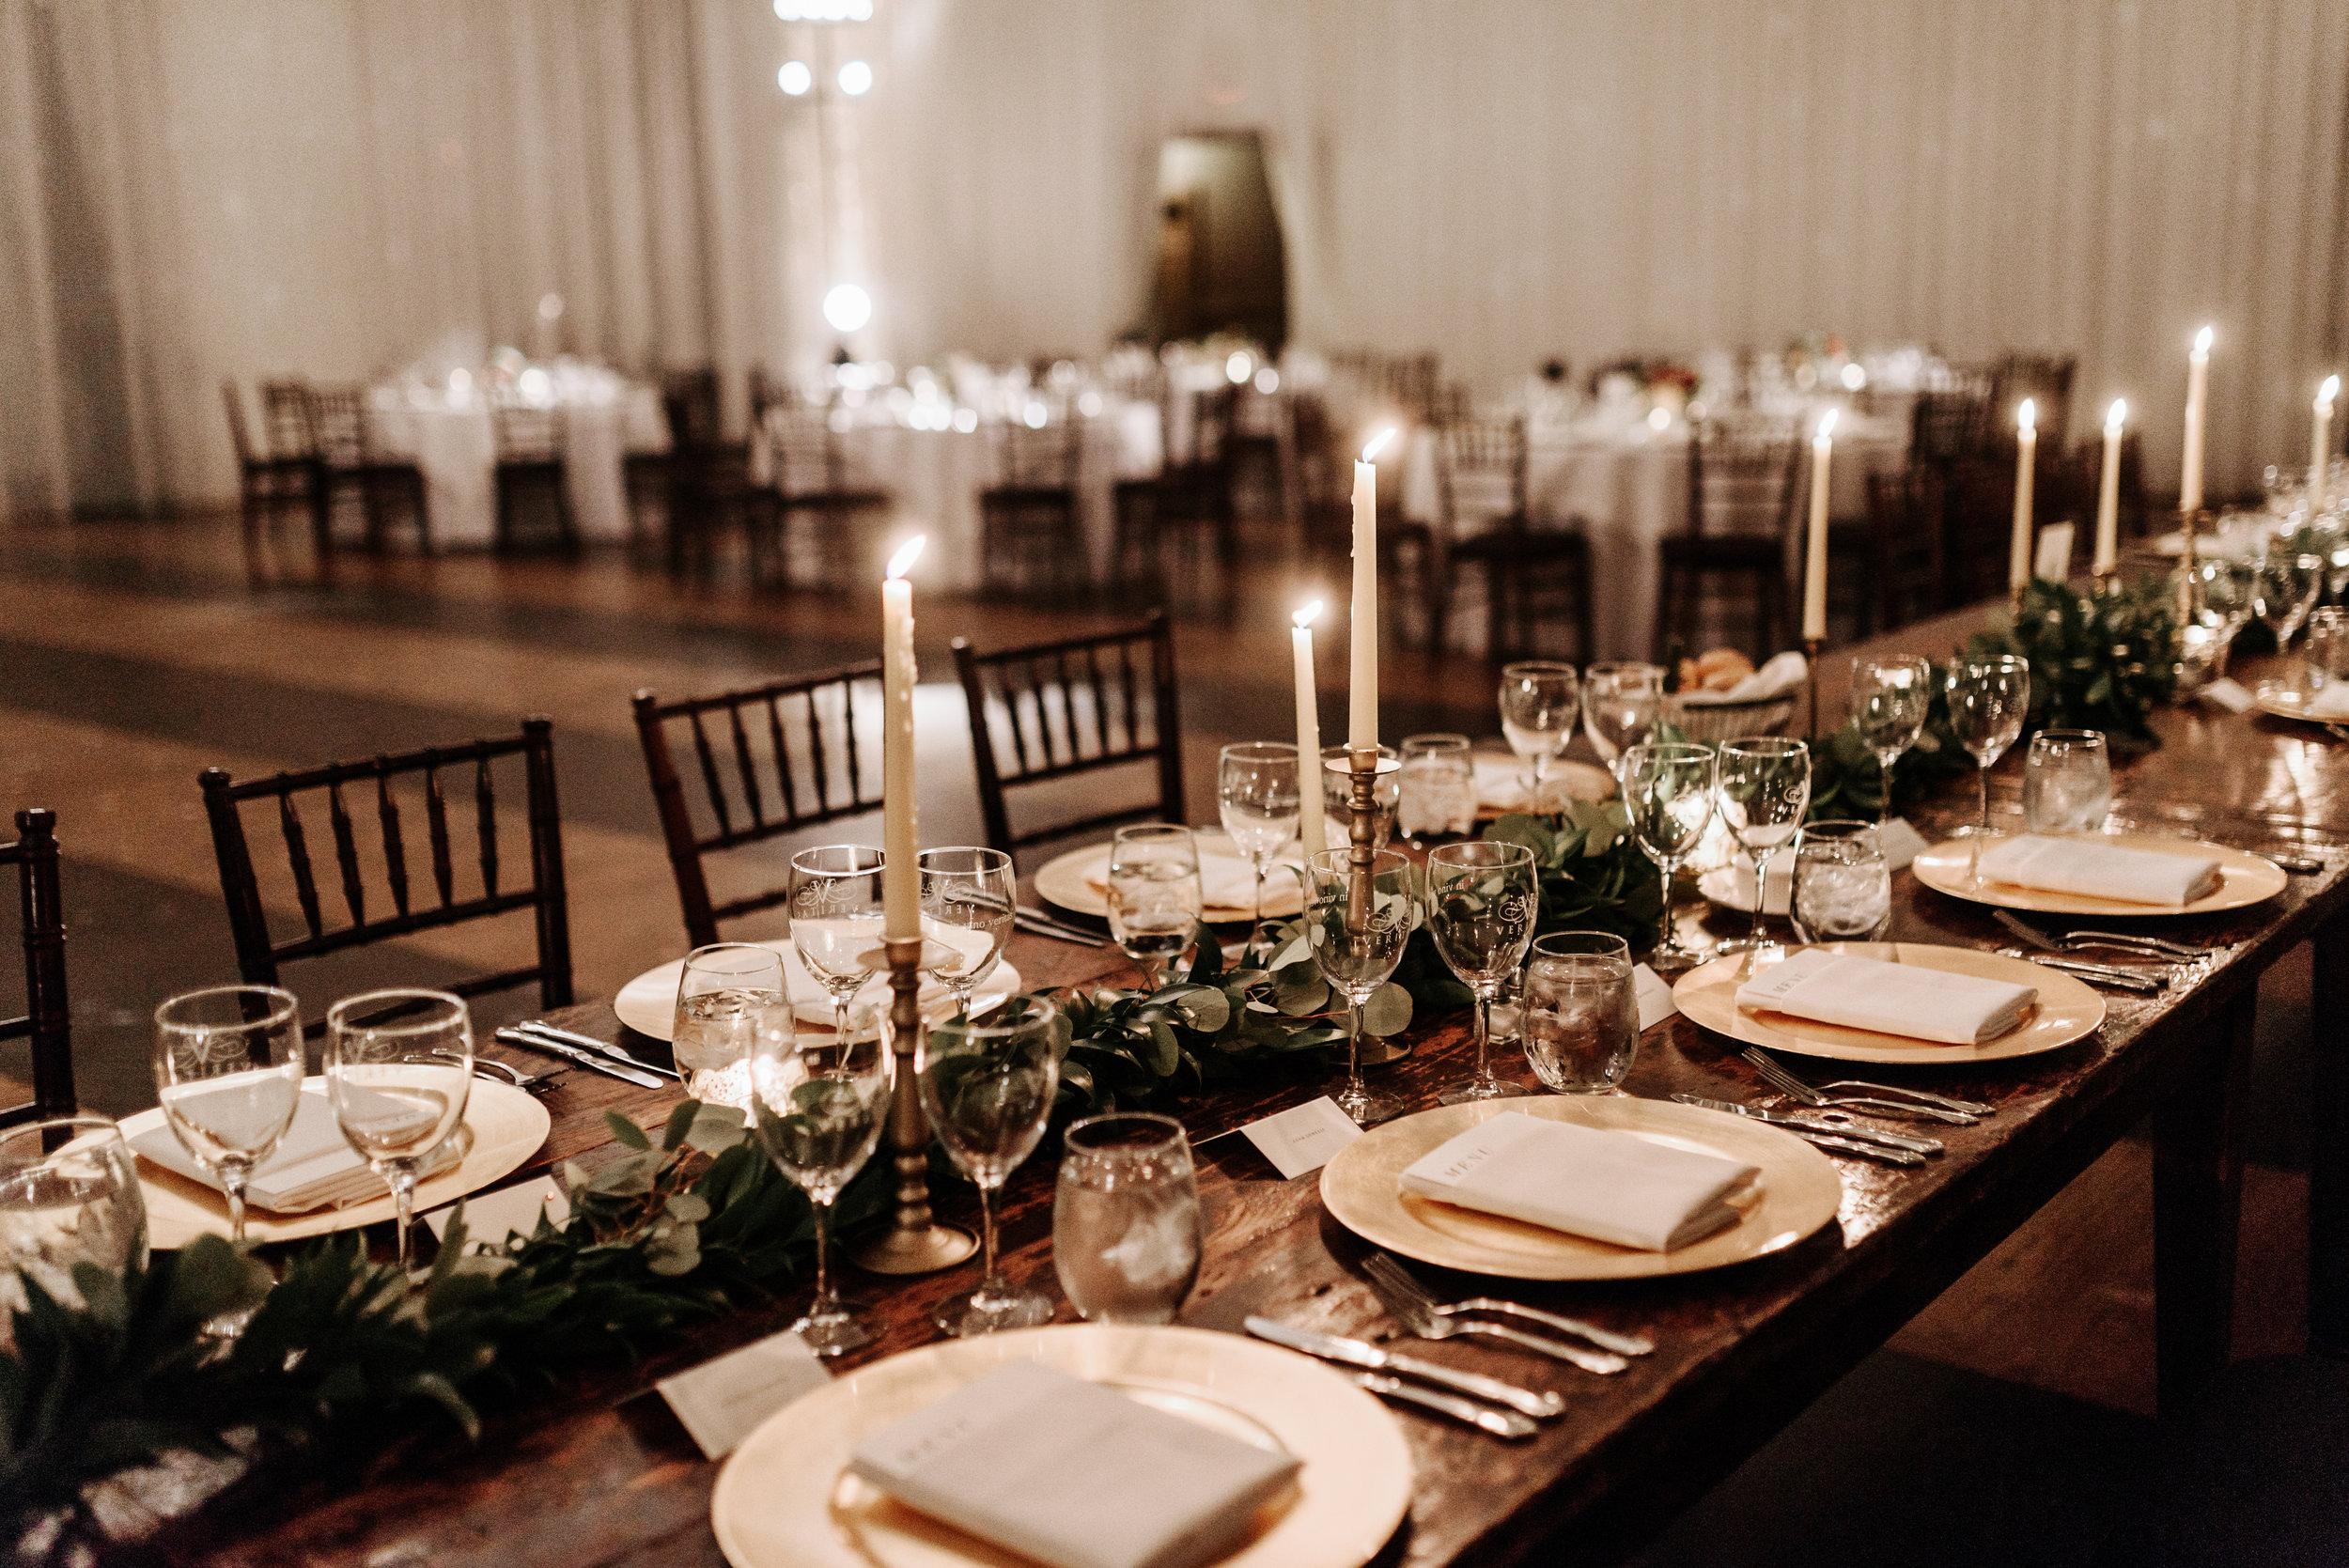 Veritas-Vineyards-and-Winery-Wedding-Photography-Afton-Virginia-Yasmin-Seth-Photography-by-V-9775.jpg